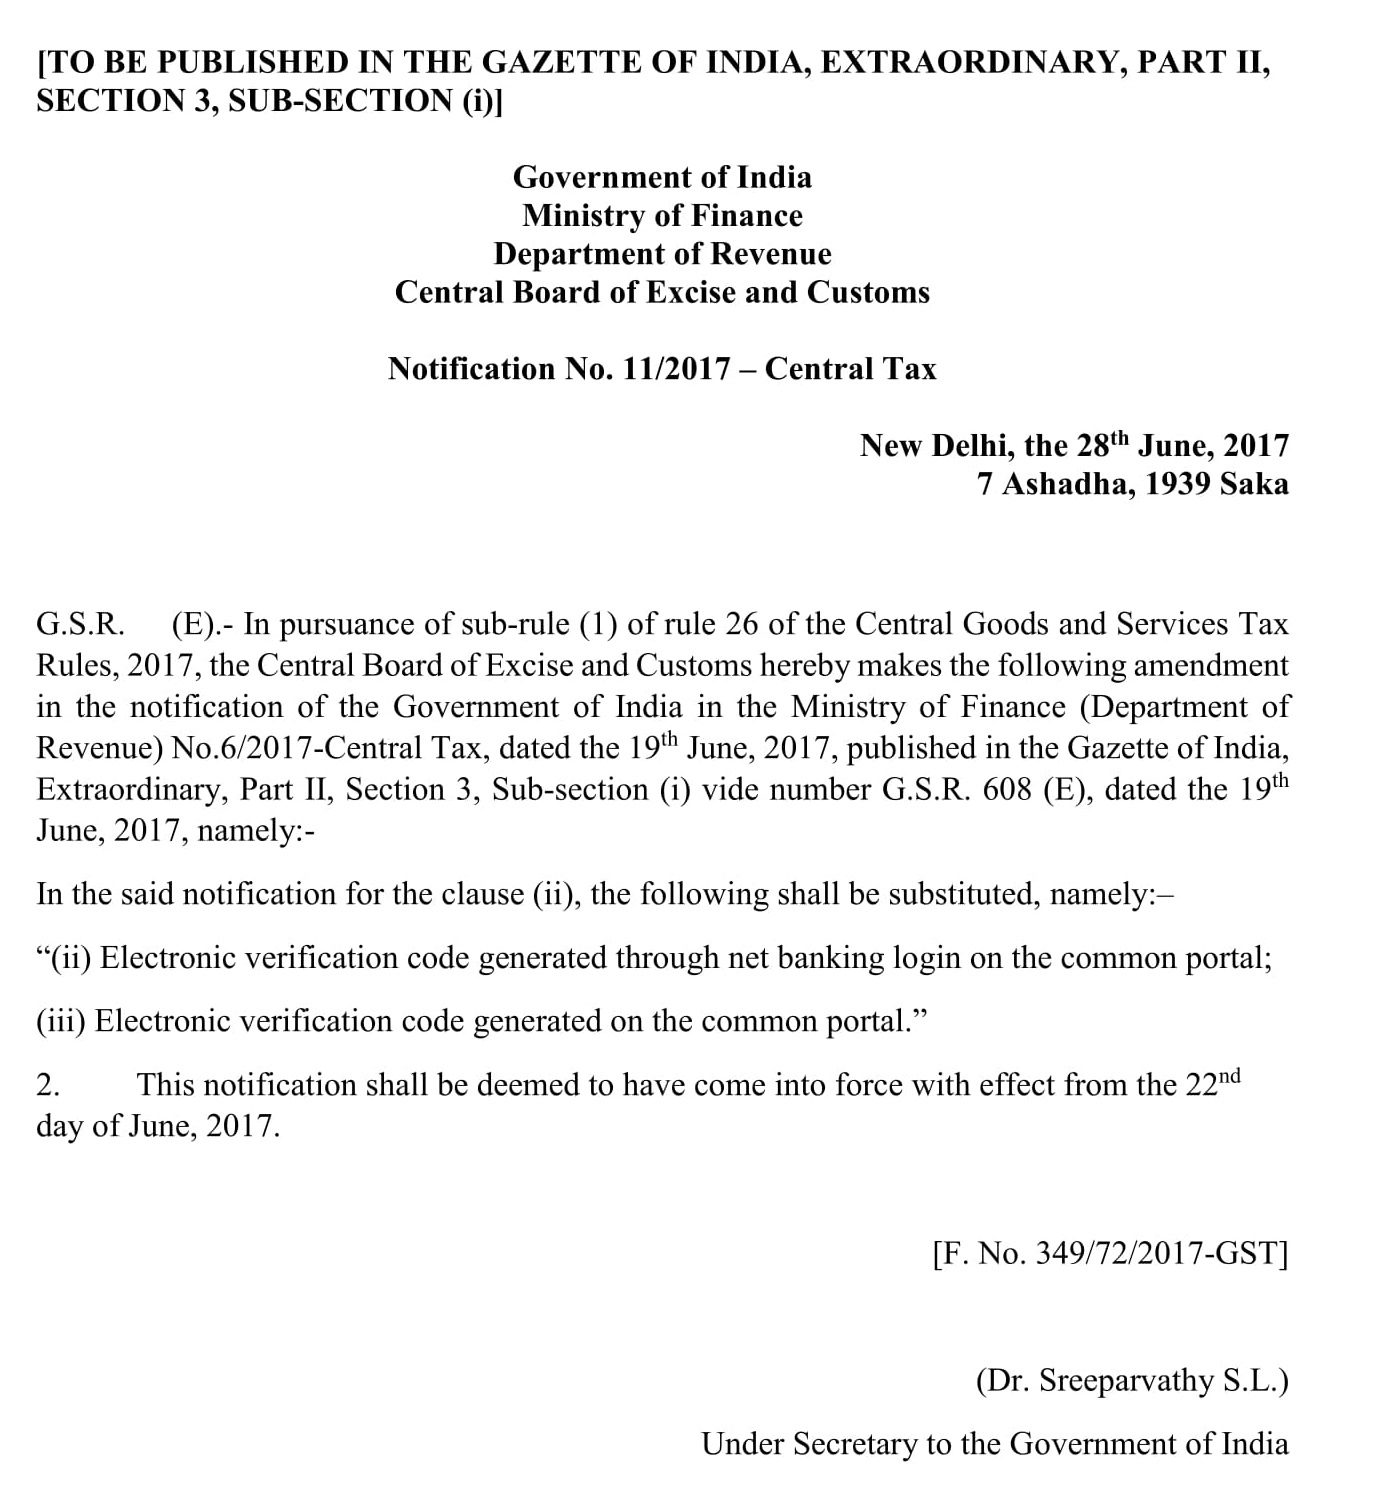 notfctn-11-central-tax-english-1.jpg